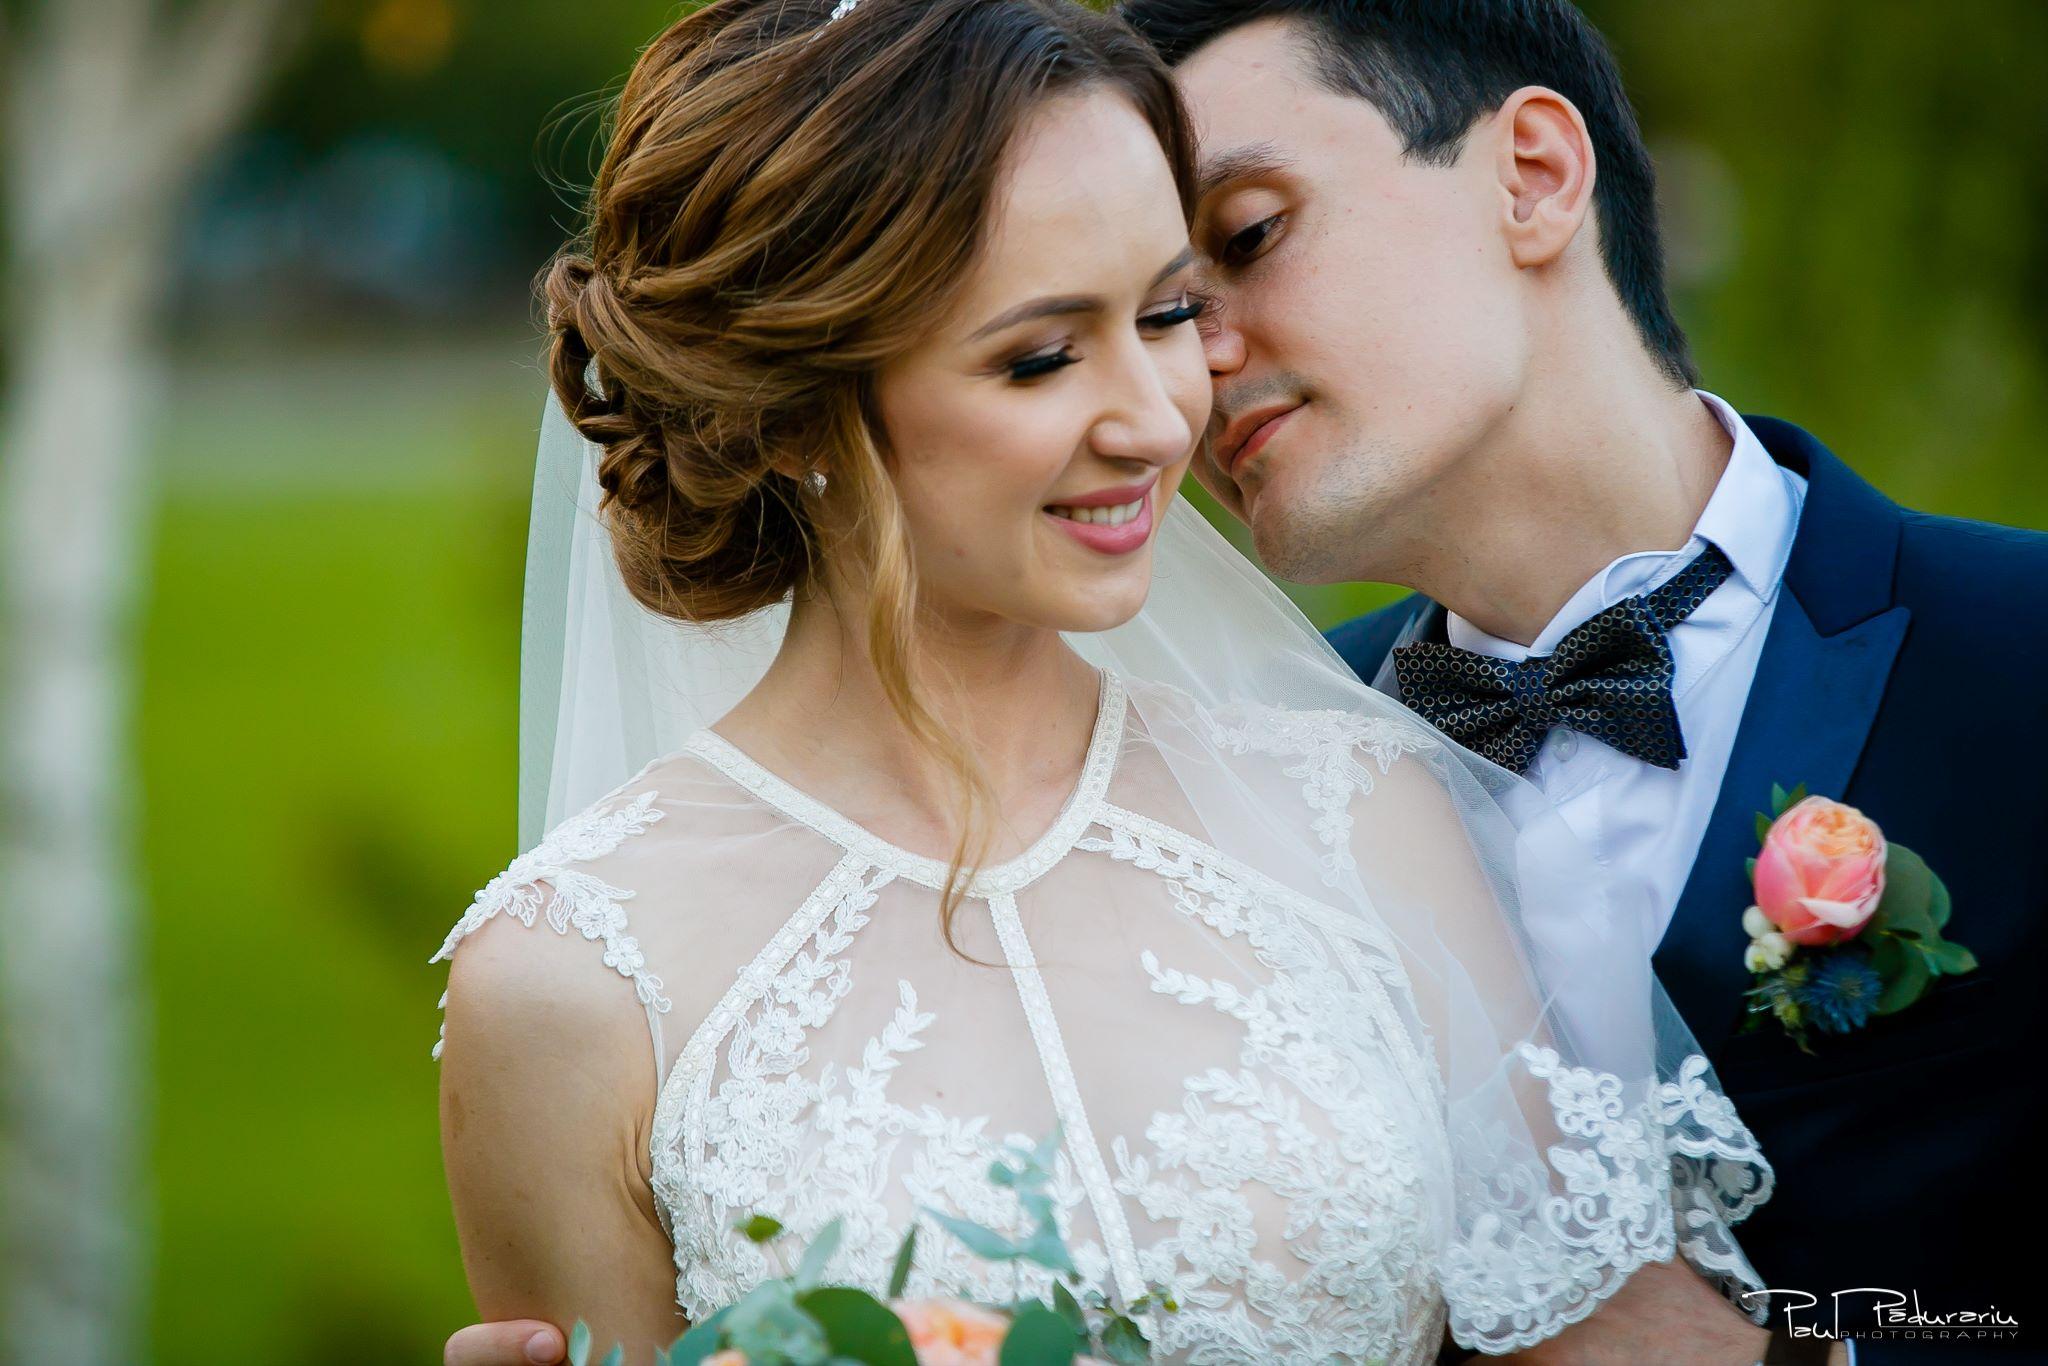 Nicoleta si Catalin fotografie nunta Iasi sedinta foto Restaurant Capitol fotograf paul padurariu 2018